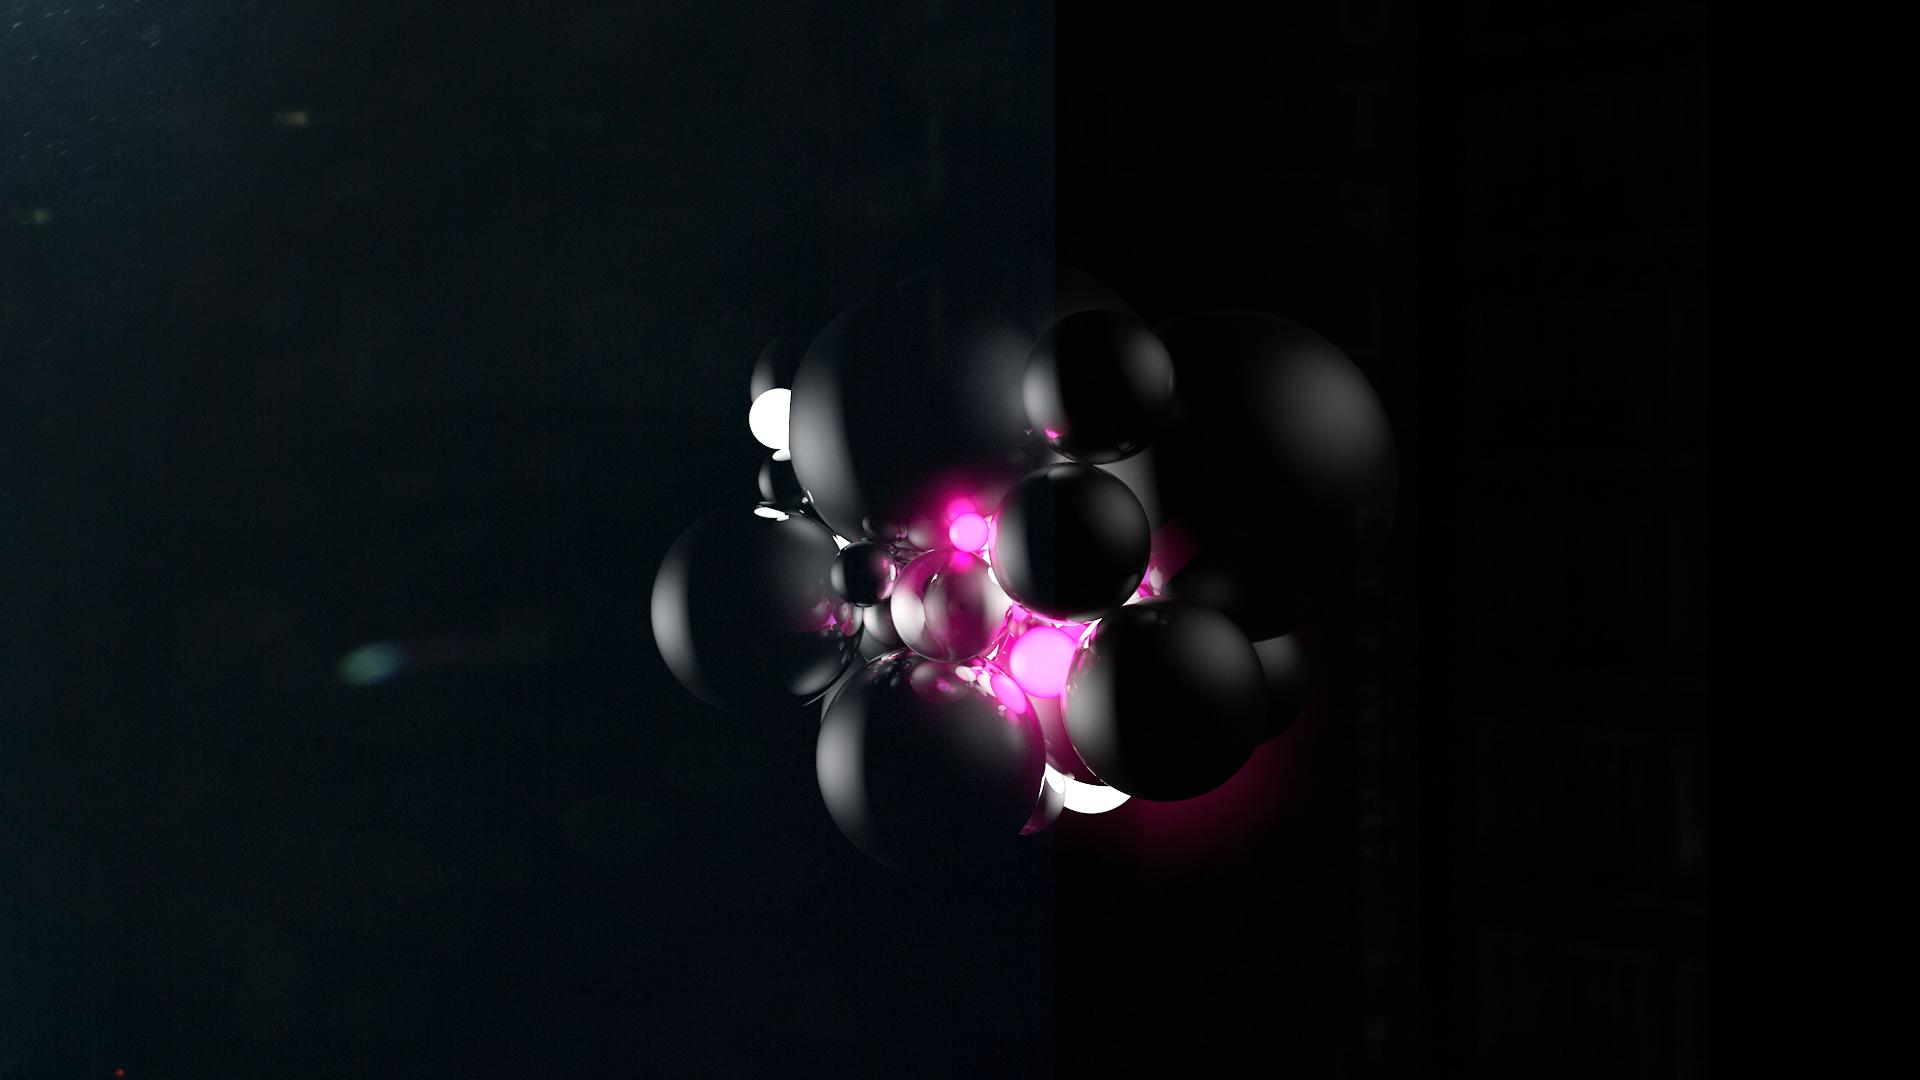 01_cc_bouncing balls_003.png